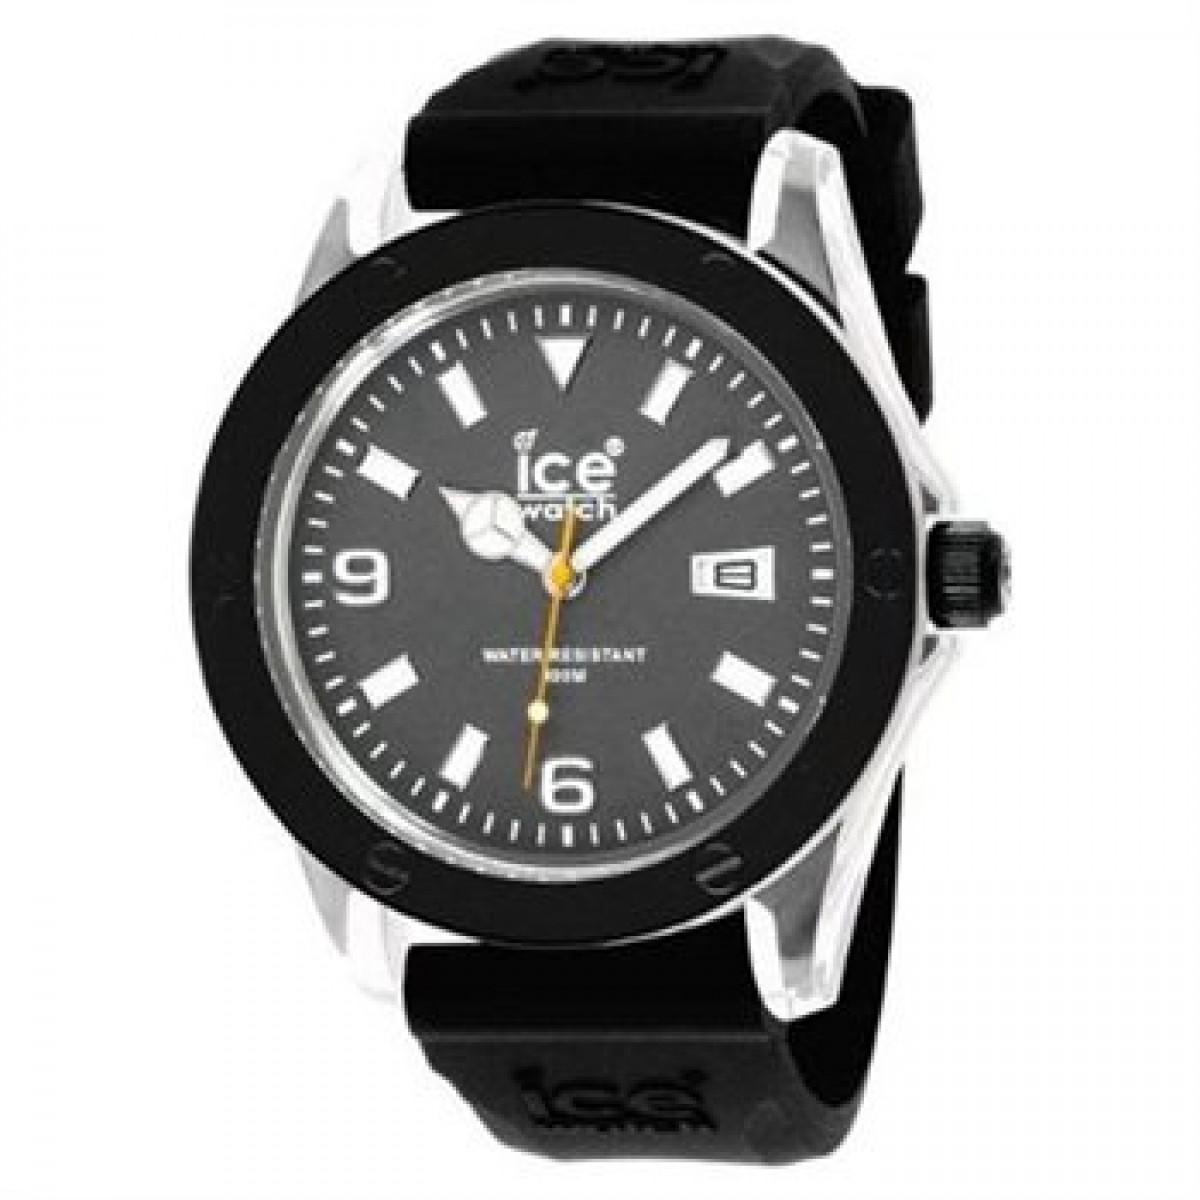 Часовник Ice-Watch XX.BK.XX.S.09 Big